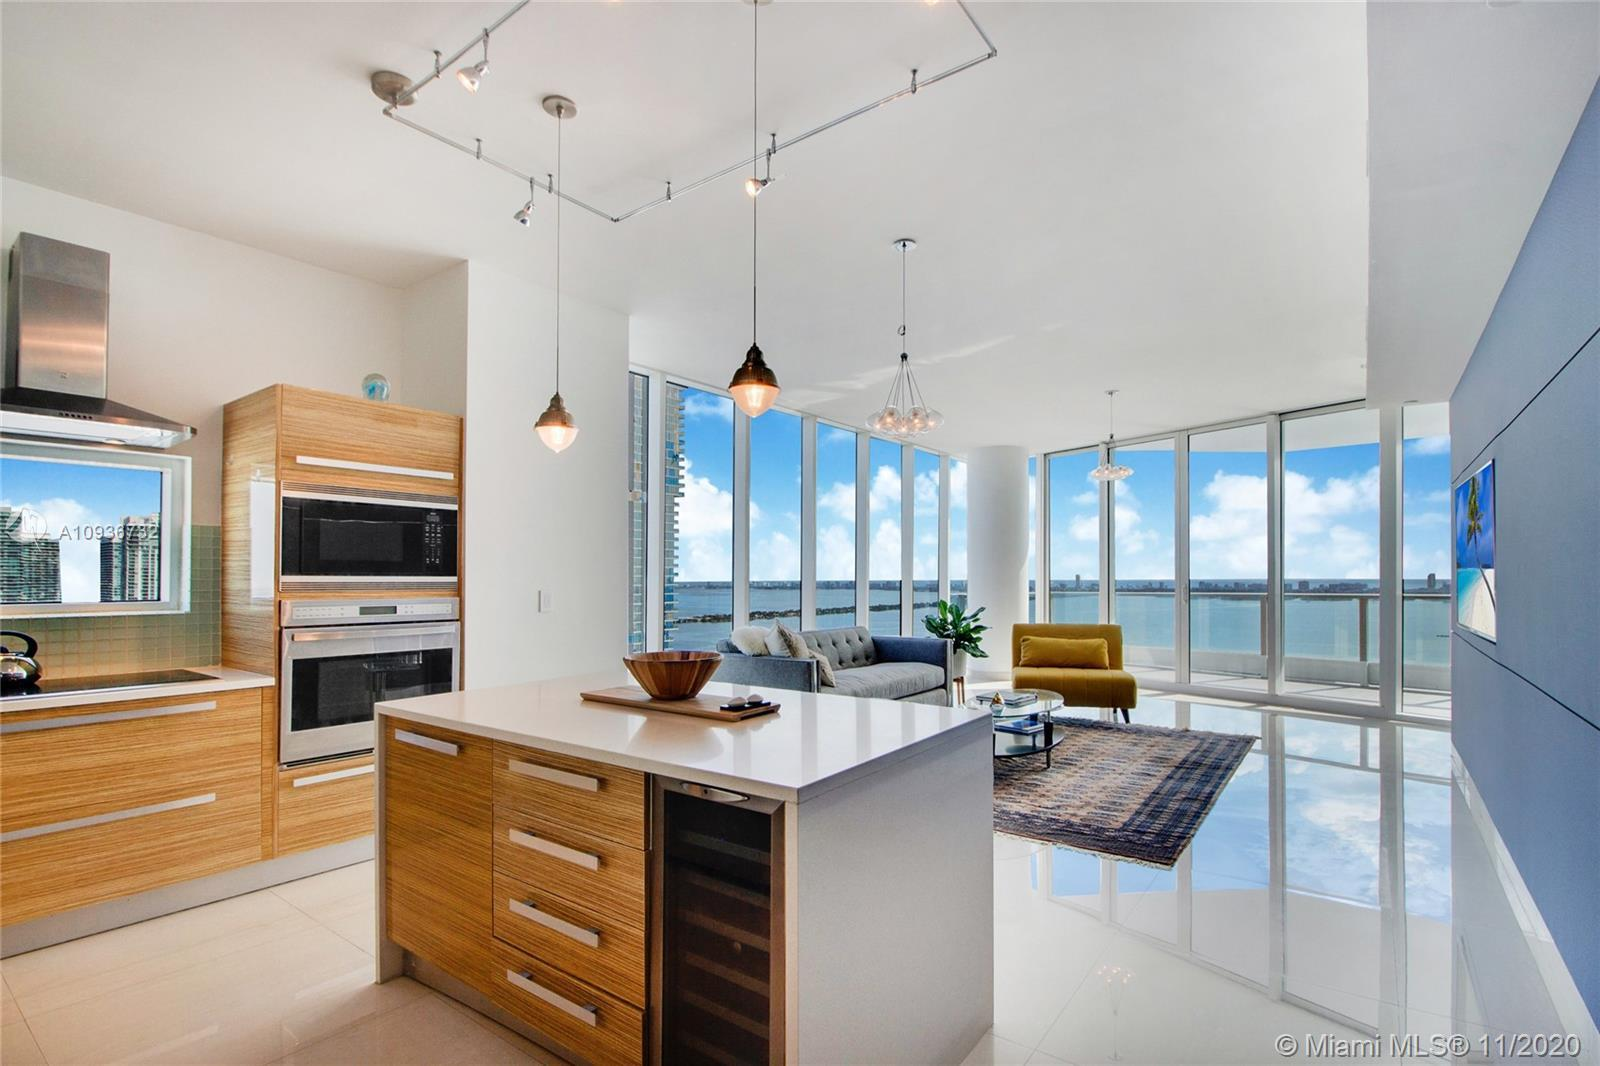 Miami's premier residential luxury development envisioned by artist & designer Lenny Kravitz - Param